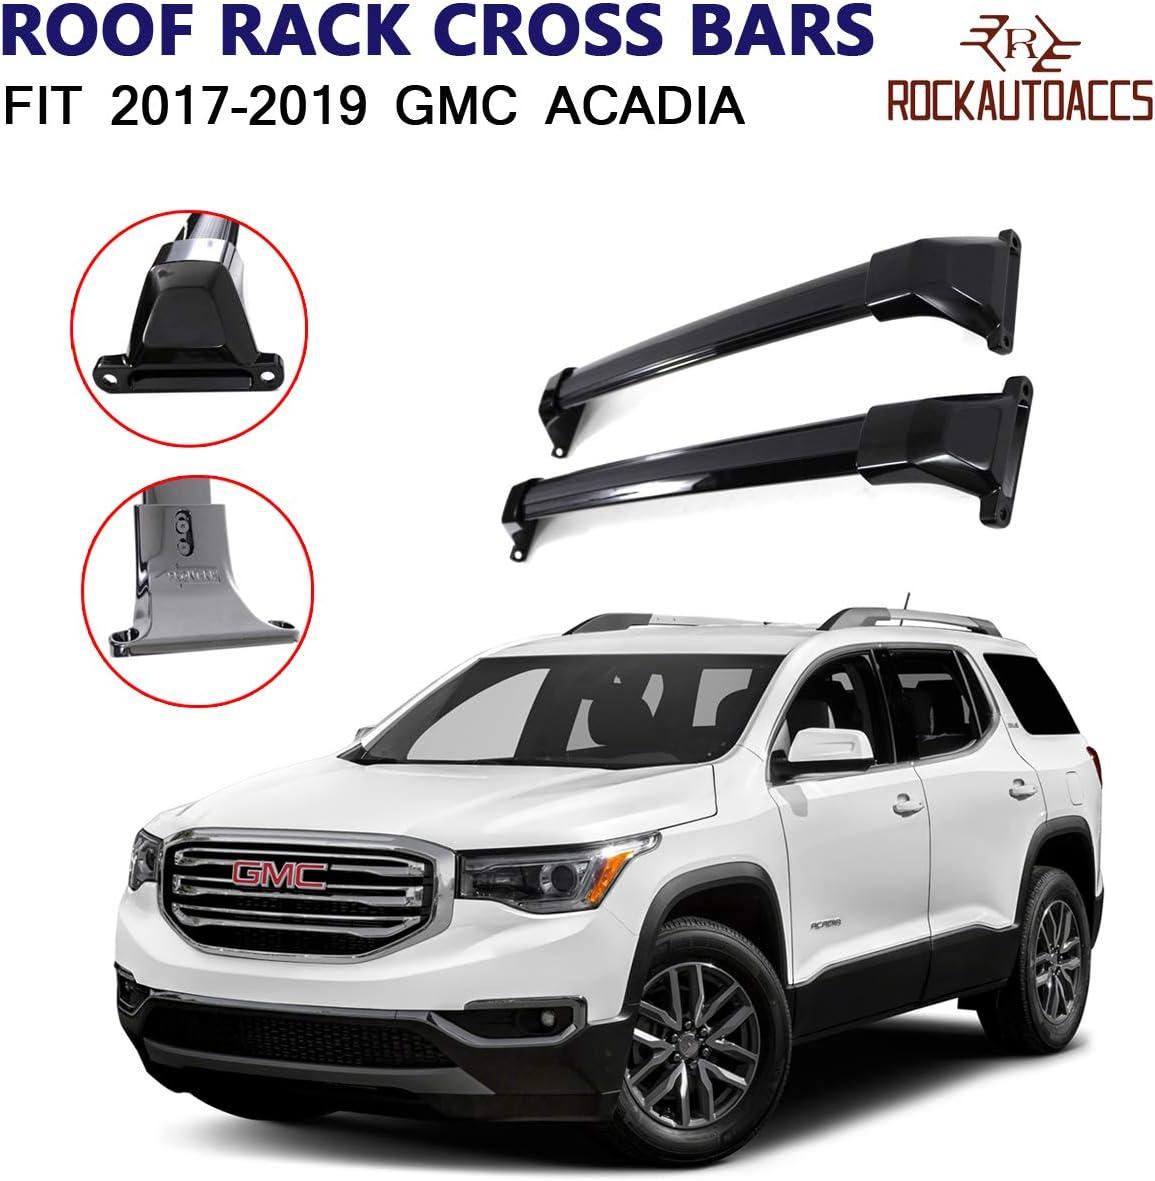 ROKIOTOEX Roof Rack Crossbars Roof Rail Cross Bars Fit 2017 2018 2019 GMC Acadia Side Rails Rooftop Cargo Bag Holder Luggage Kayak Carrier Aluminum Black